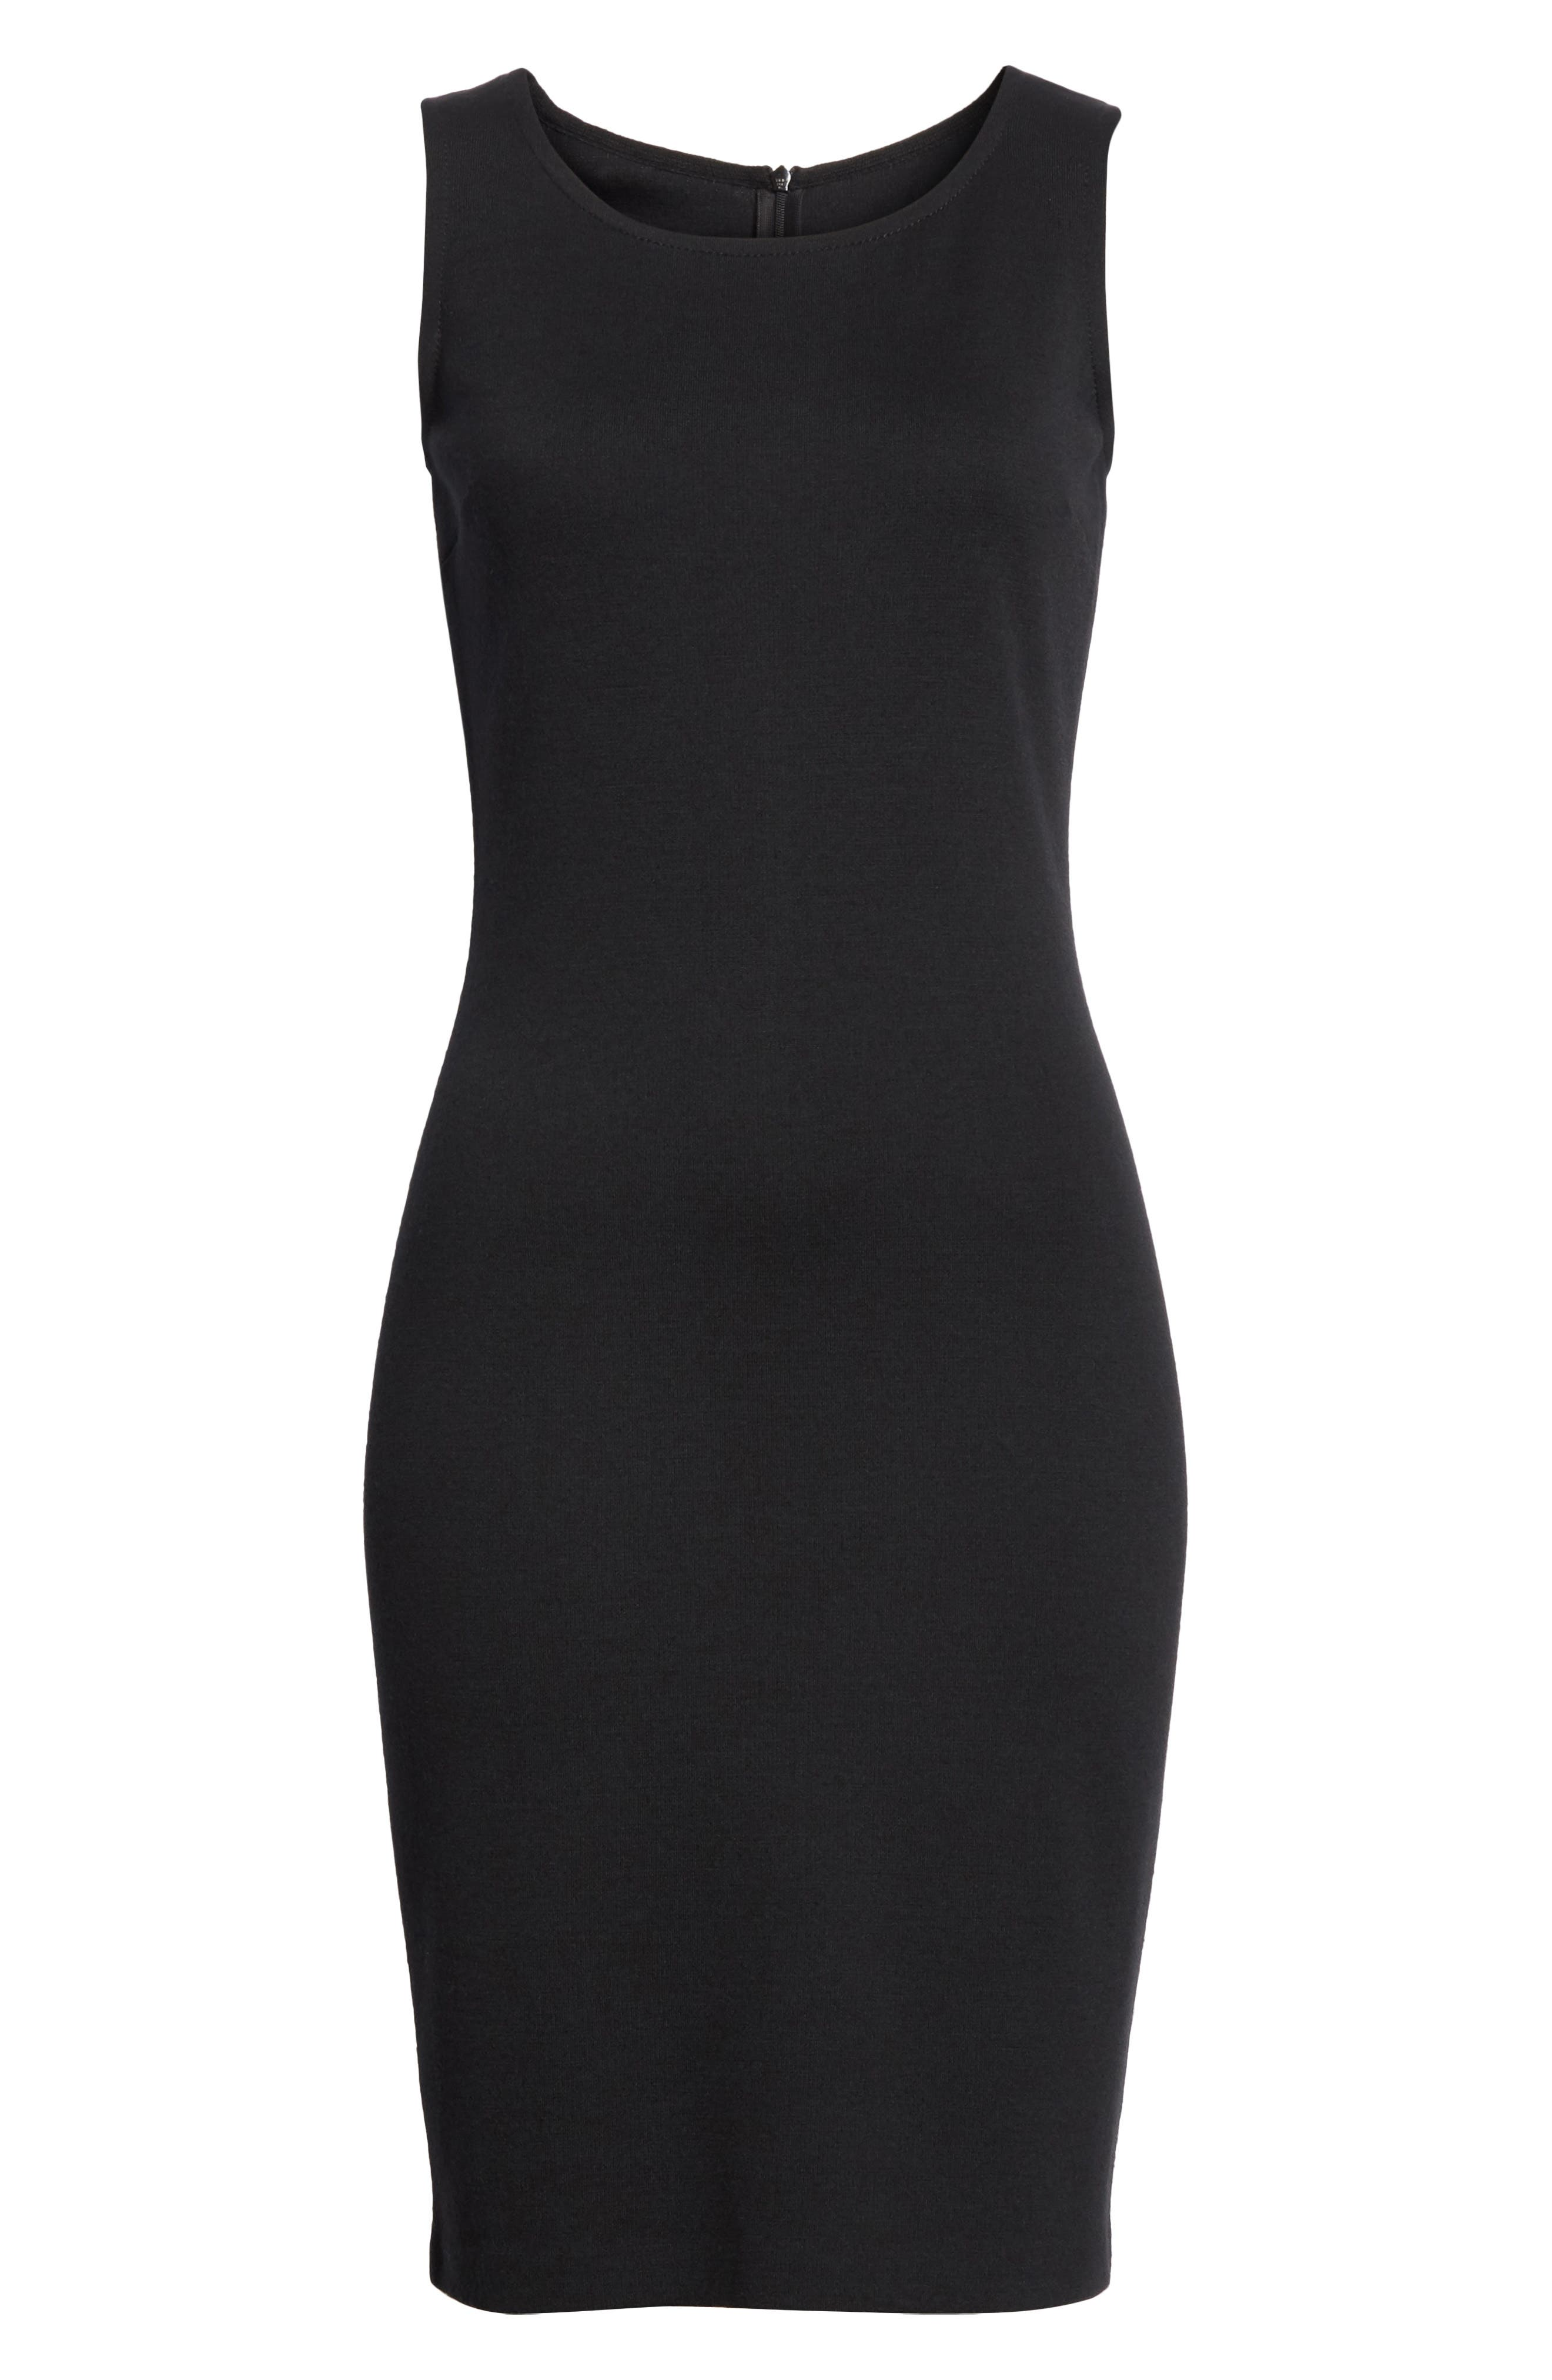 ST. JOHN COLLECTION, Sleeveless Milano Knit Dress, Alternate thumbnail 7, color, CAVIAR